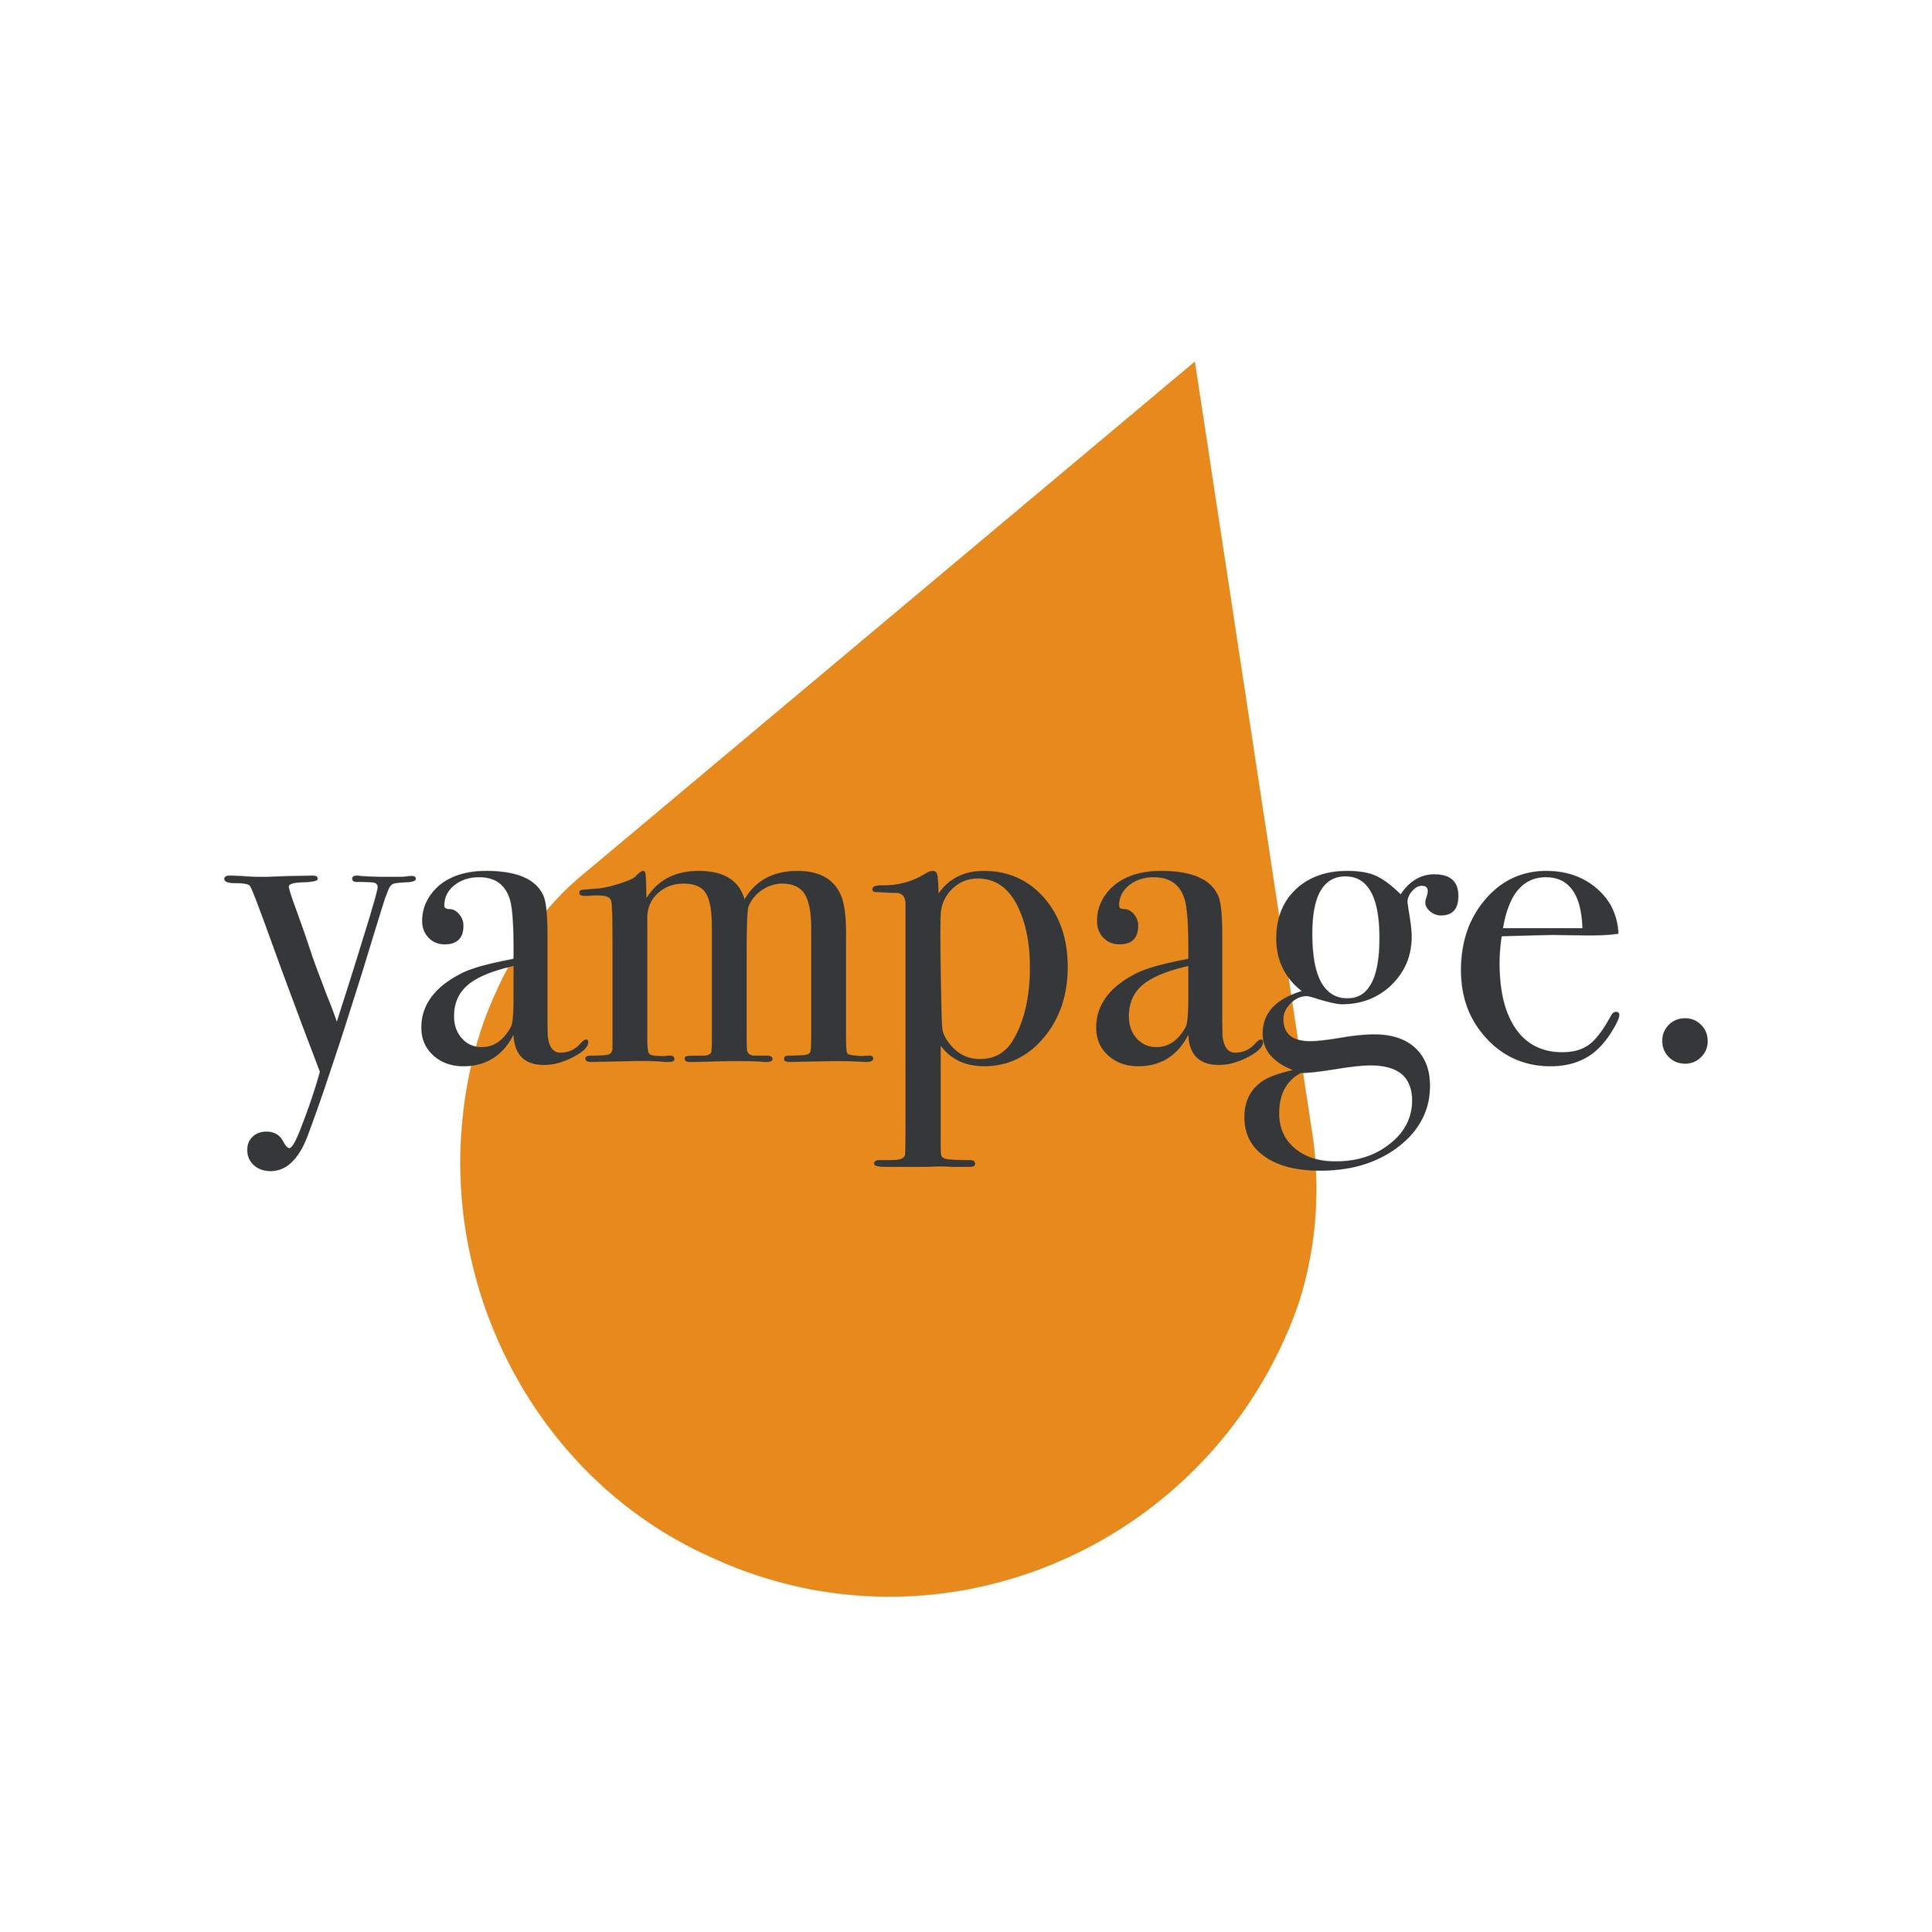 YamPage Workspace (Dec 22- 2018 at 2-48 PM).JPG